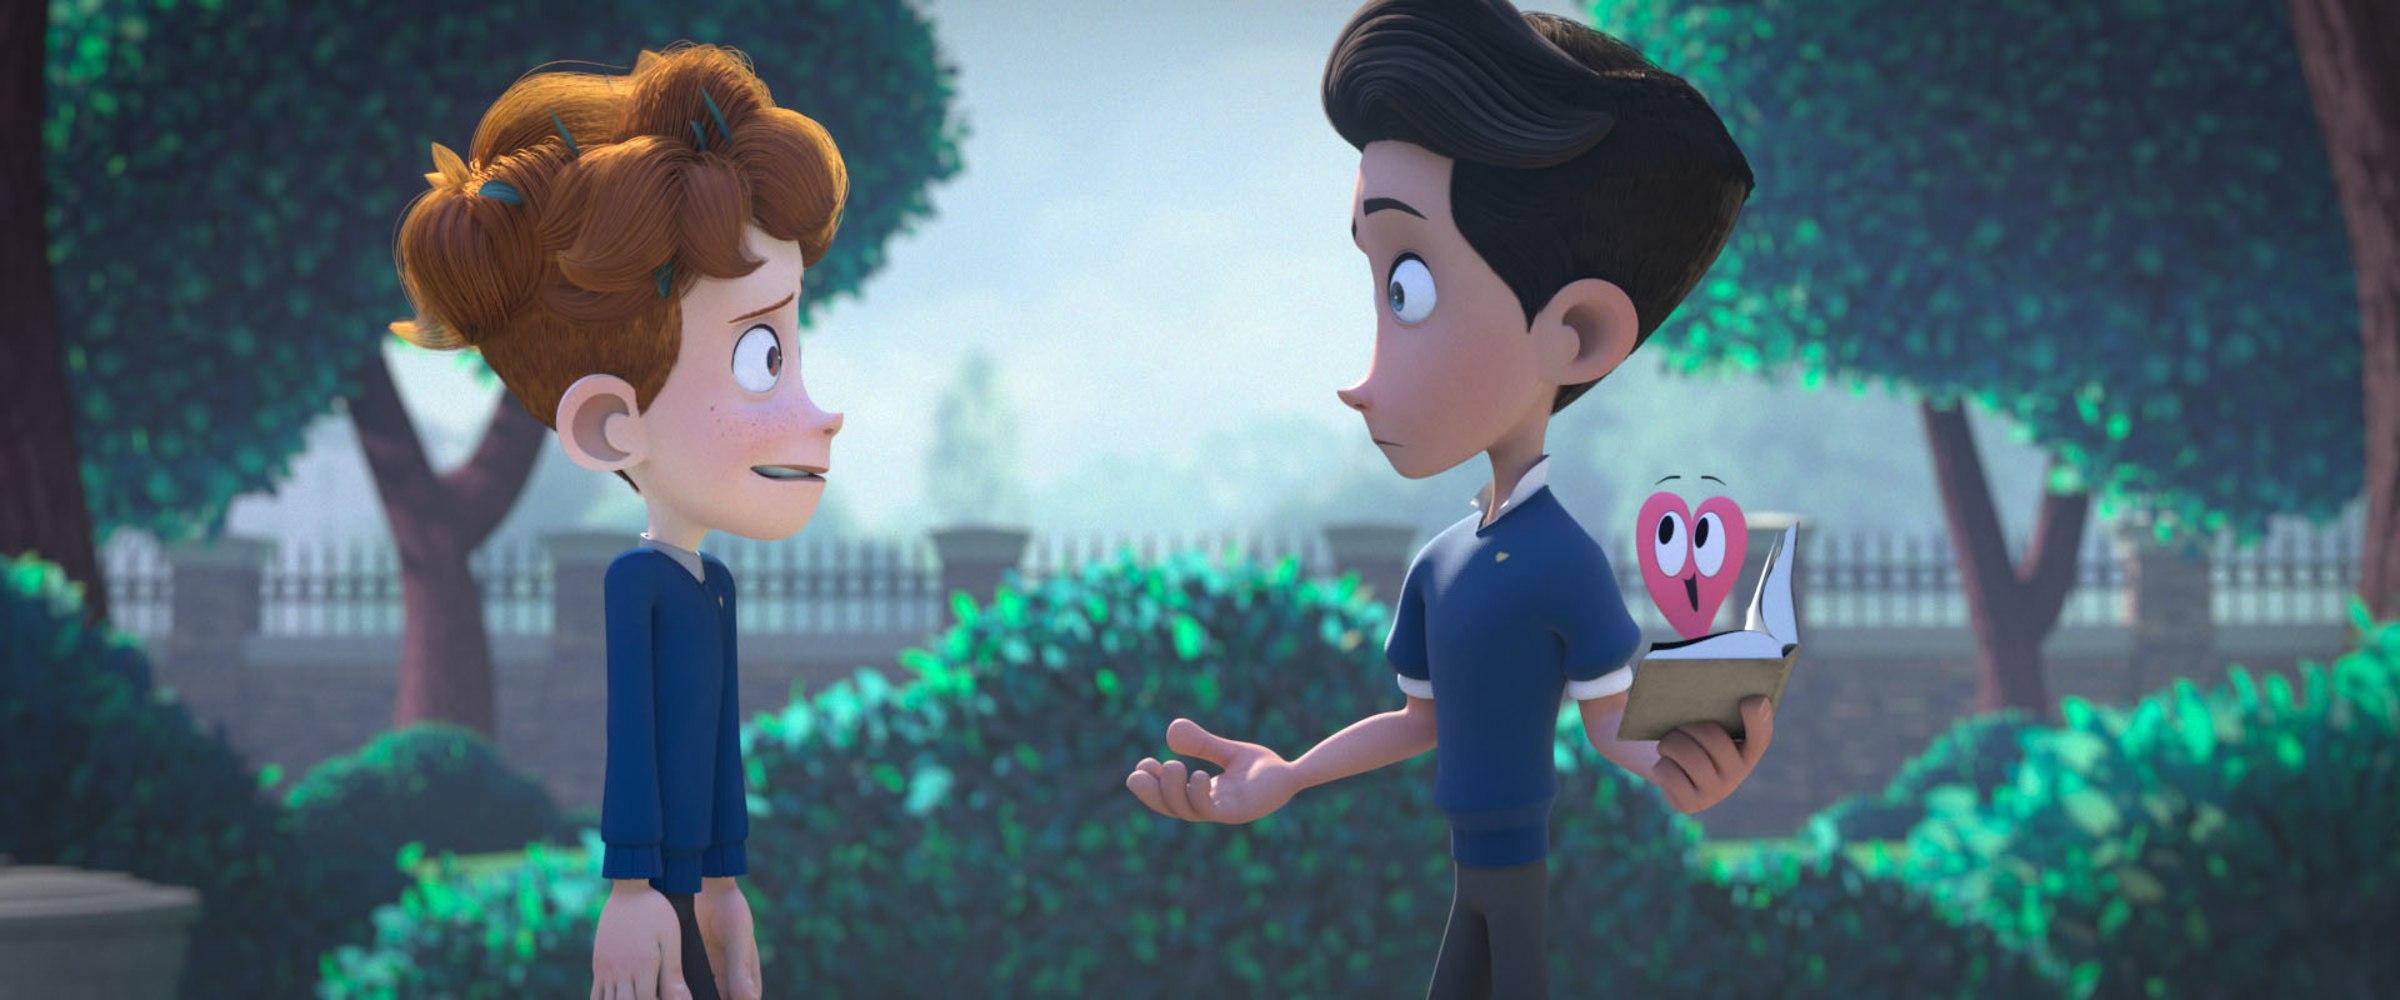 "Film still from ""In a Heartbeat"" Beth David and Esteban Bravo"